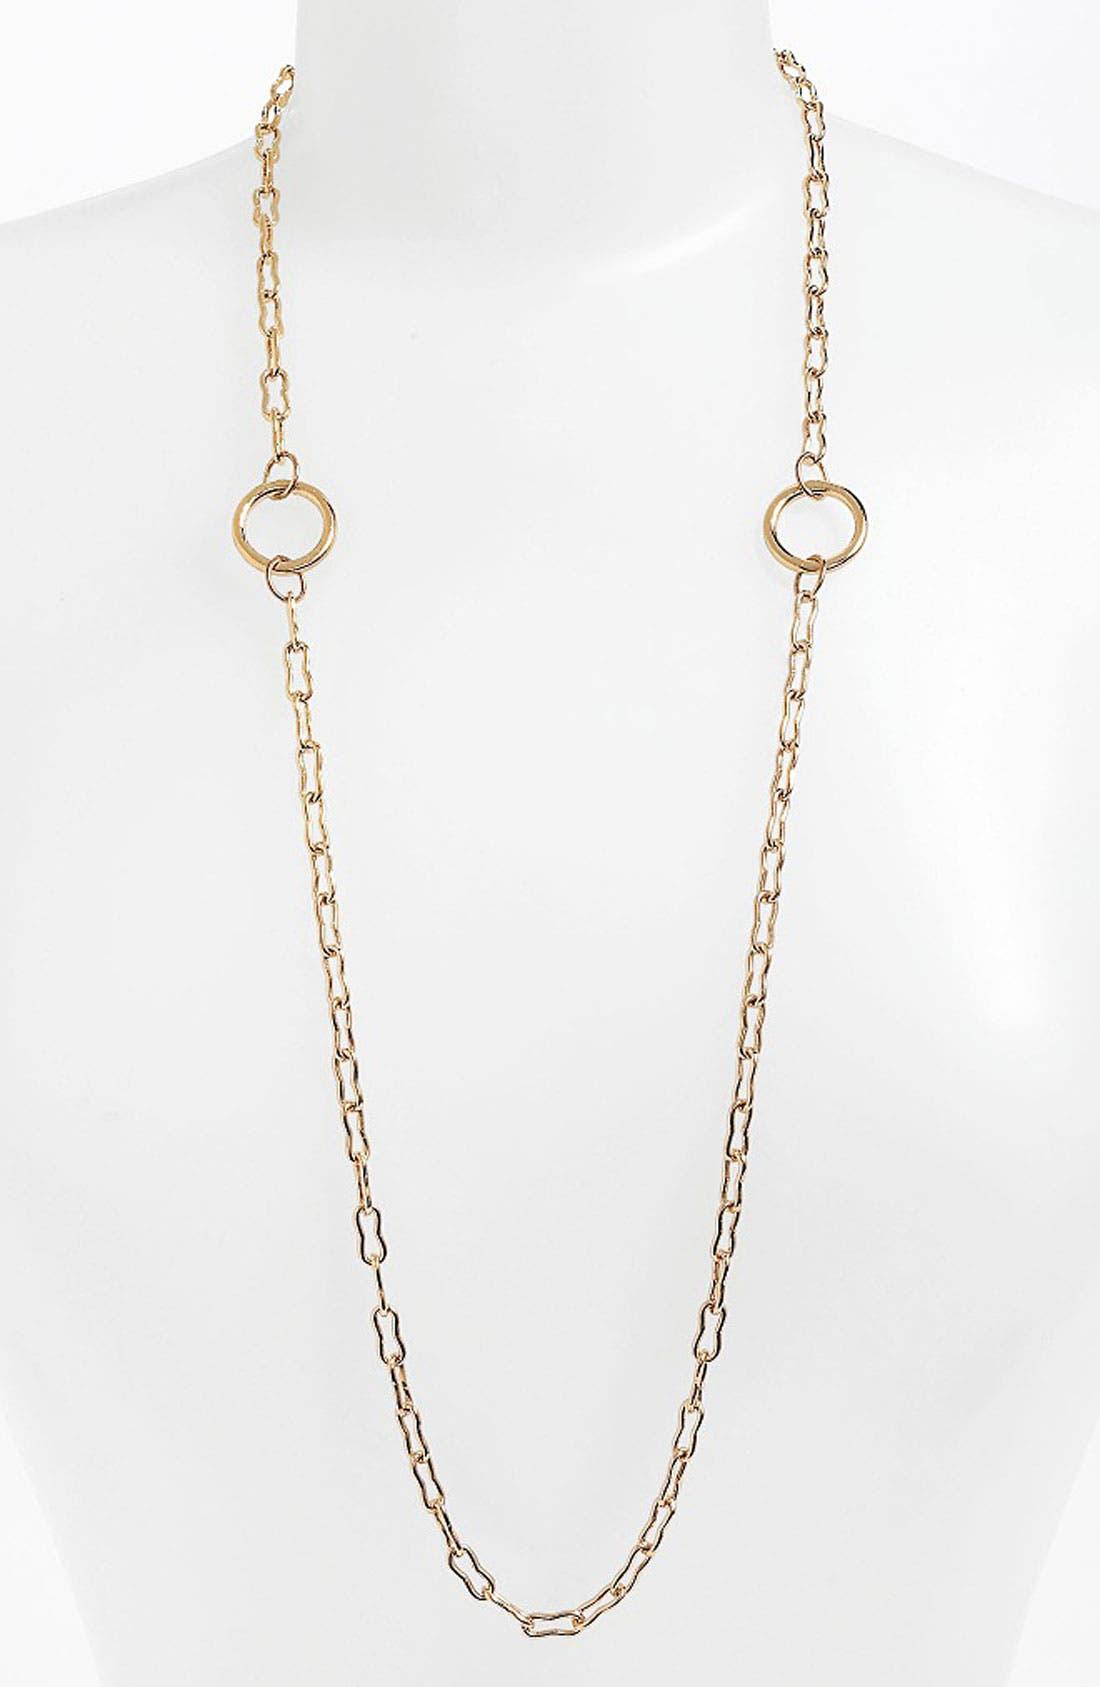 Alternate Image 1 Selected - Kelly Wearstler Bent Link Ring Necklace